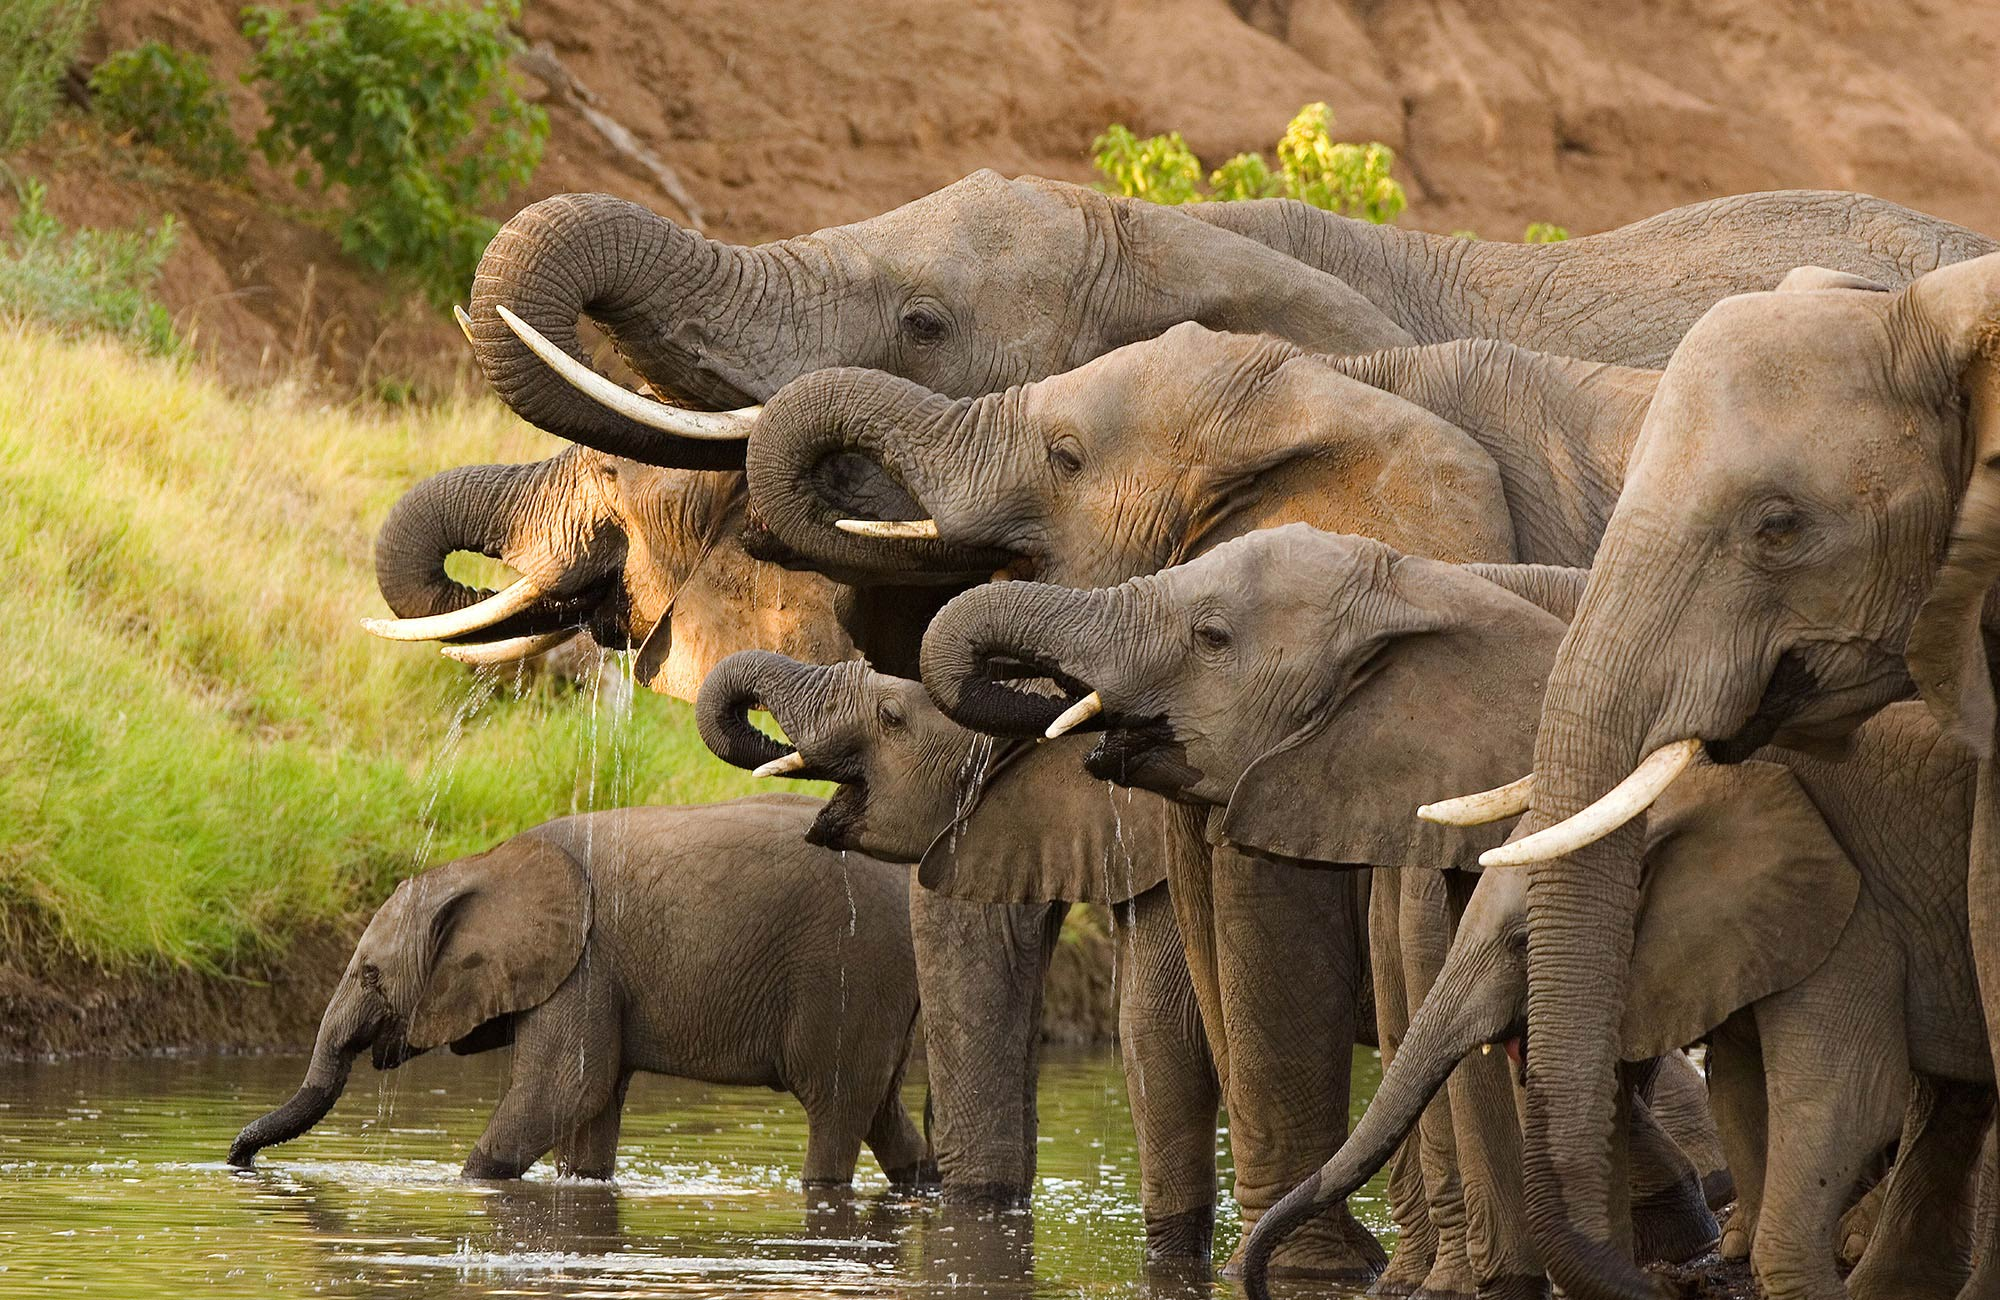 big-five-safari-sabi-sands-elephant-large.jpg